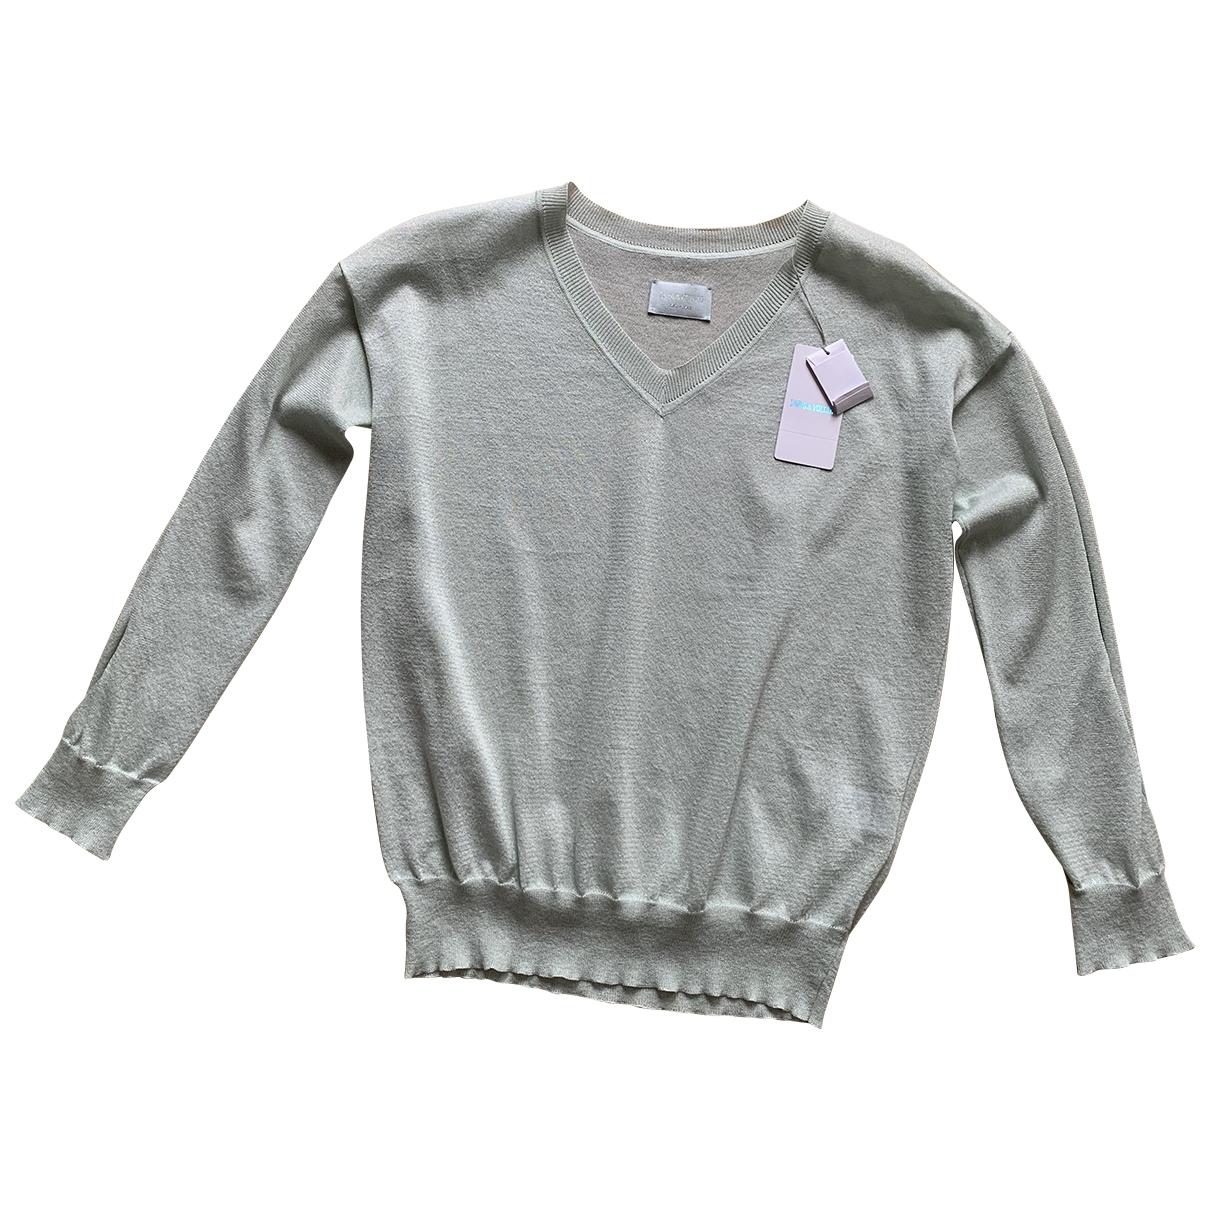 Zadig & Voltaire \N Green Knitwear for Women M International